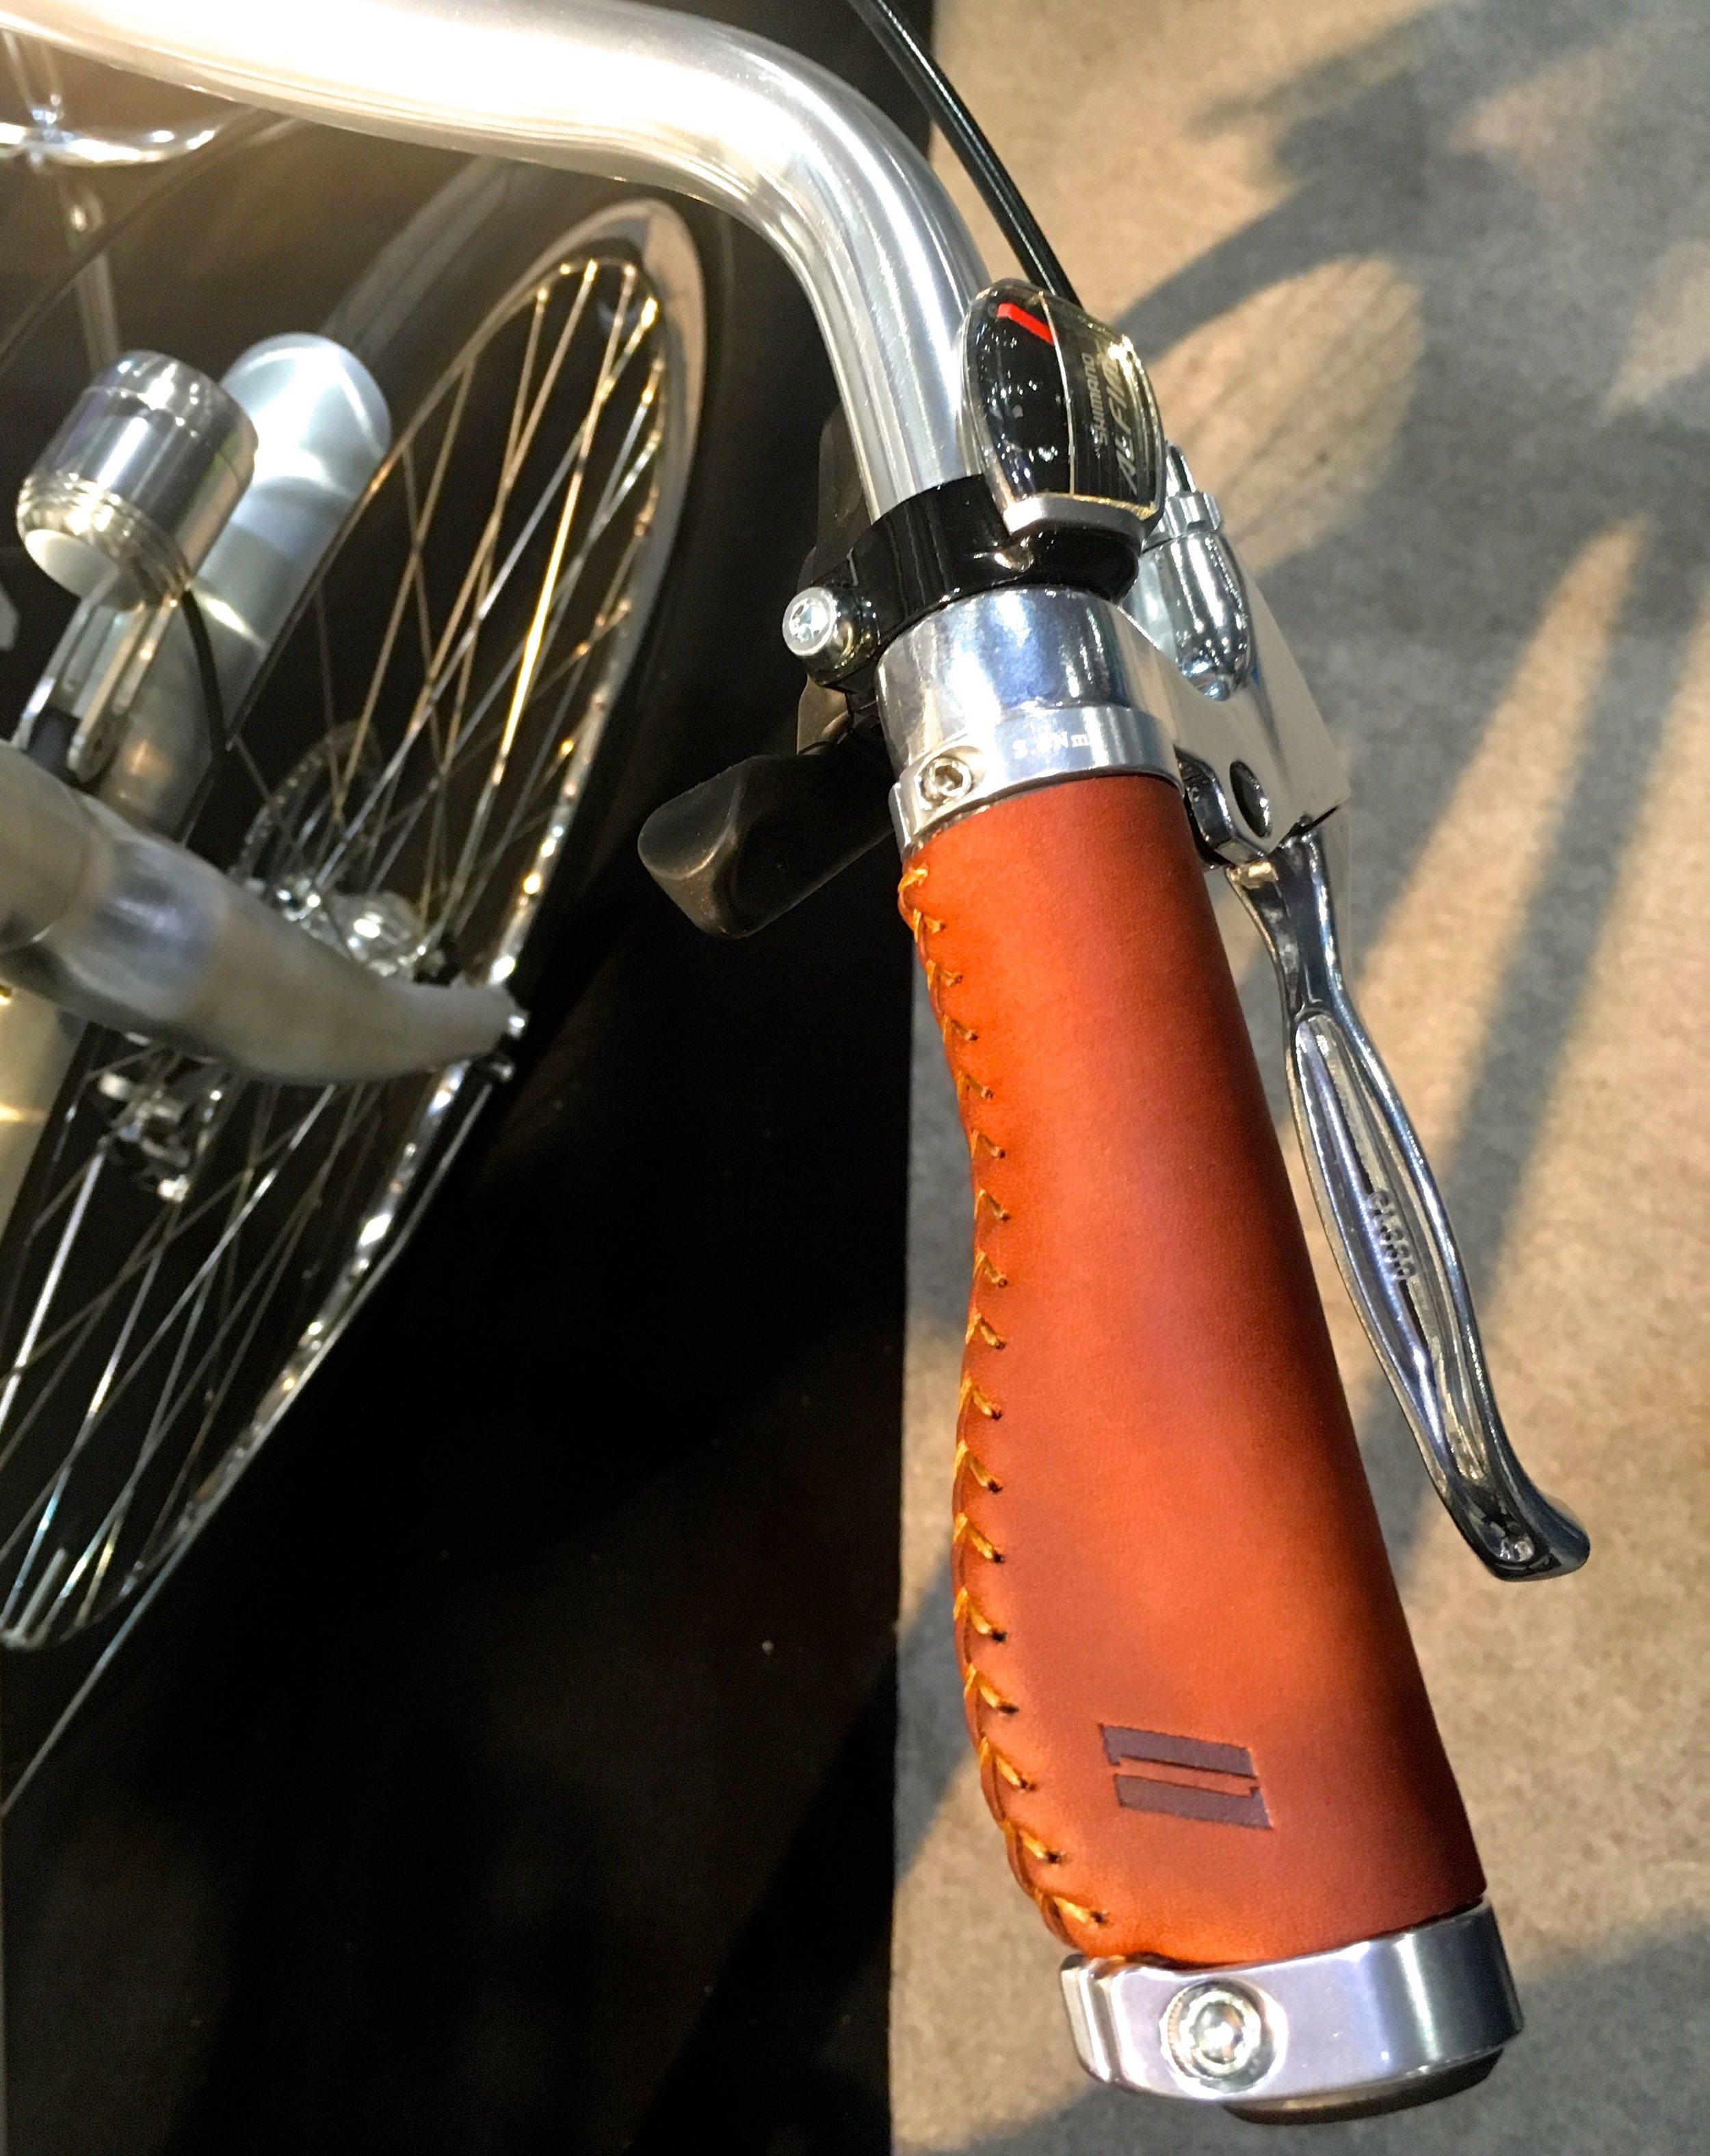 A top of the range bike at the London Bike Show